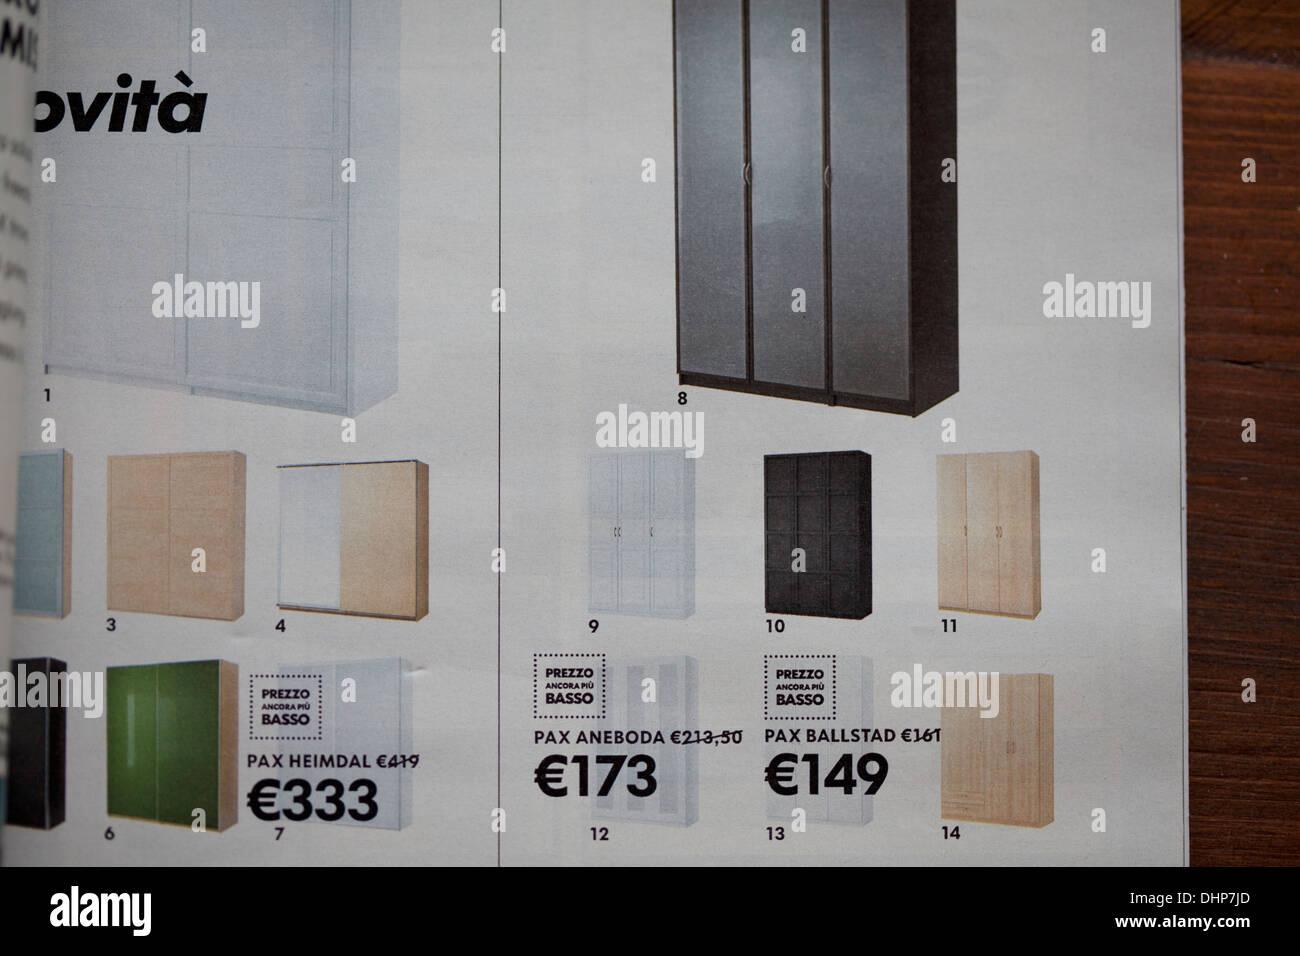 Ikea Catalog Stock Photo 62569205 Alamy